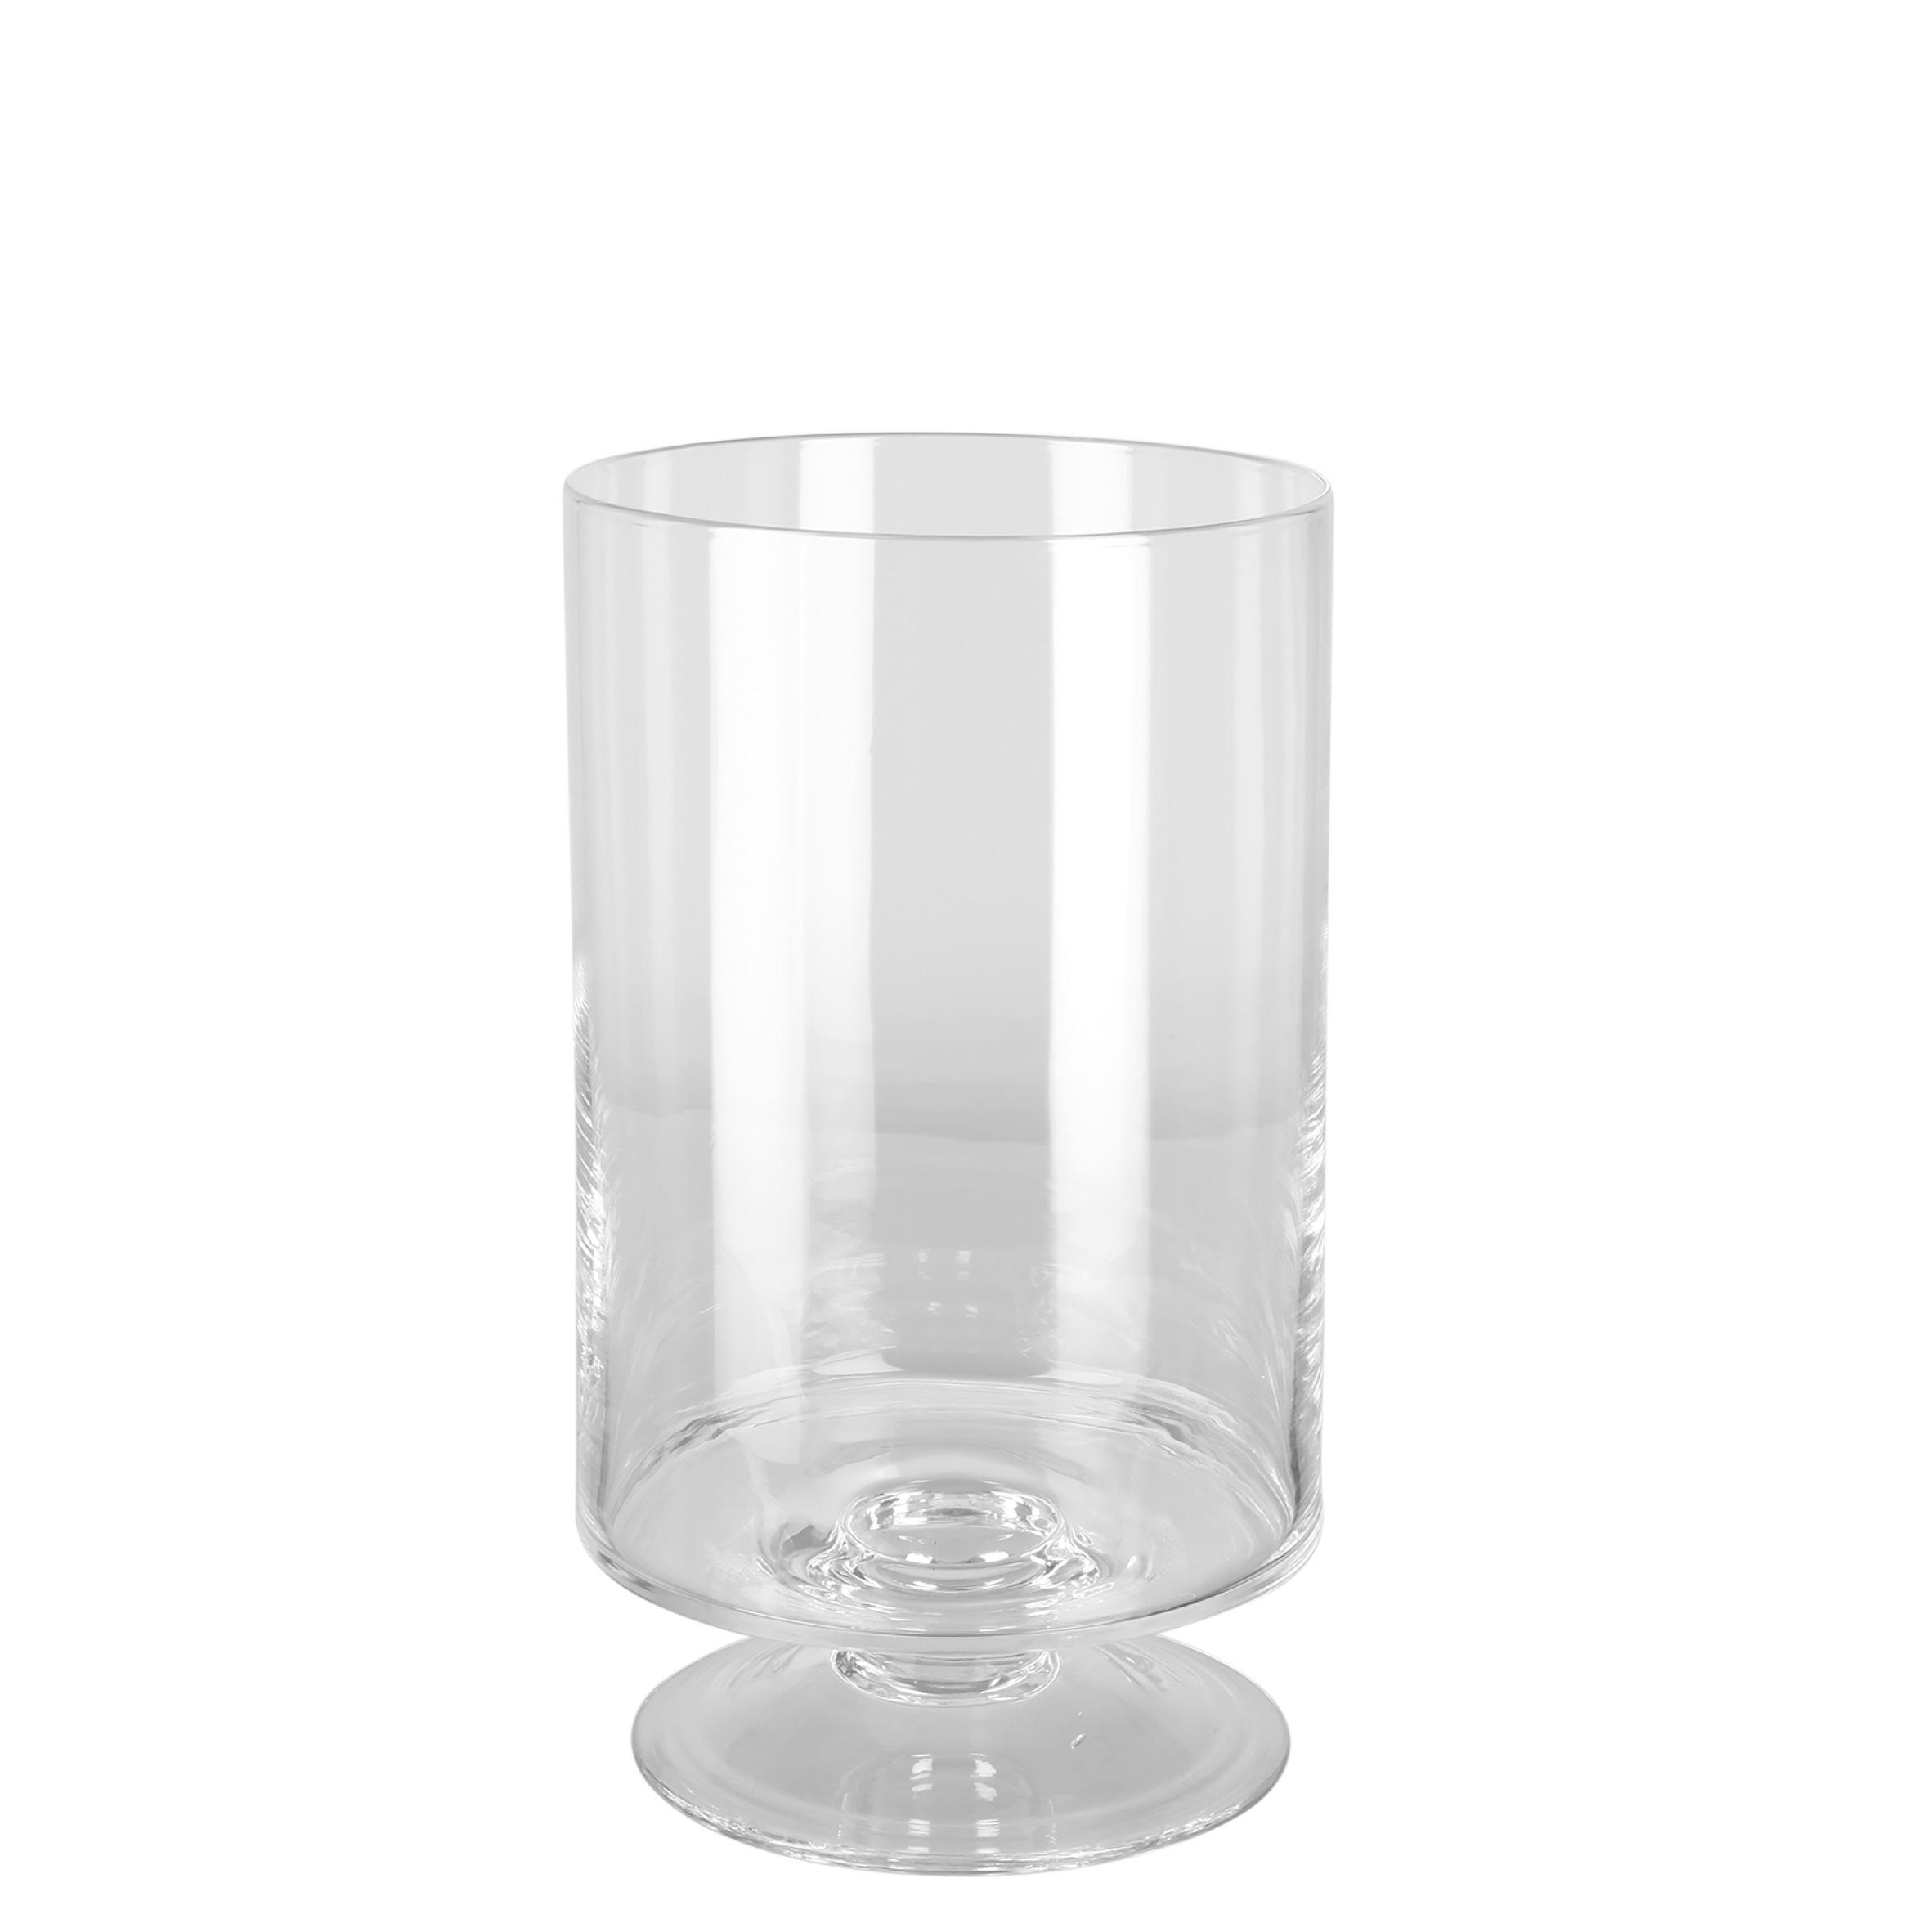 Fink Living Viana Vase Windlicht